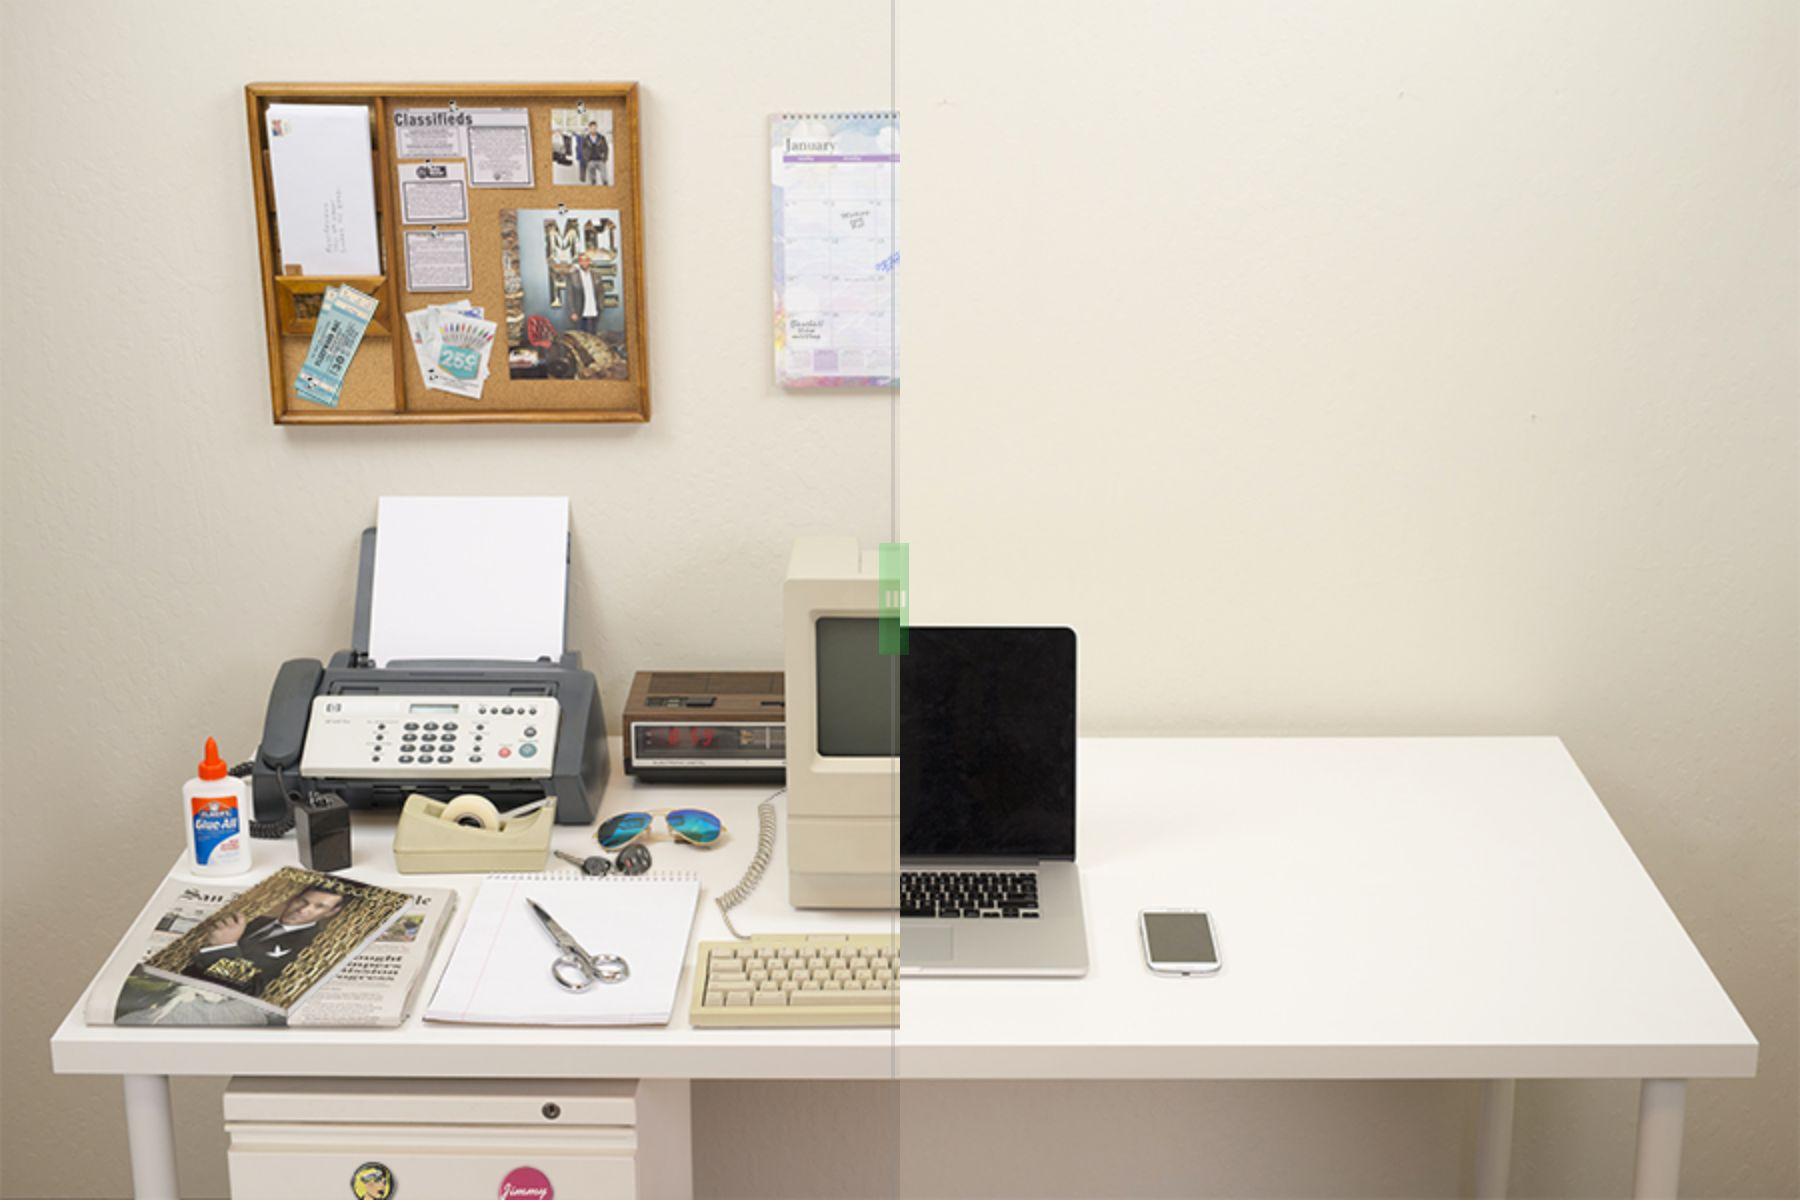 Evolution of the desk